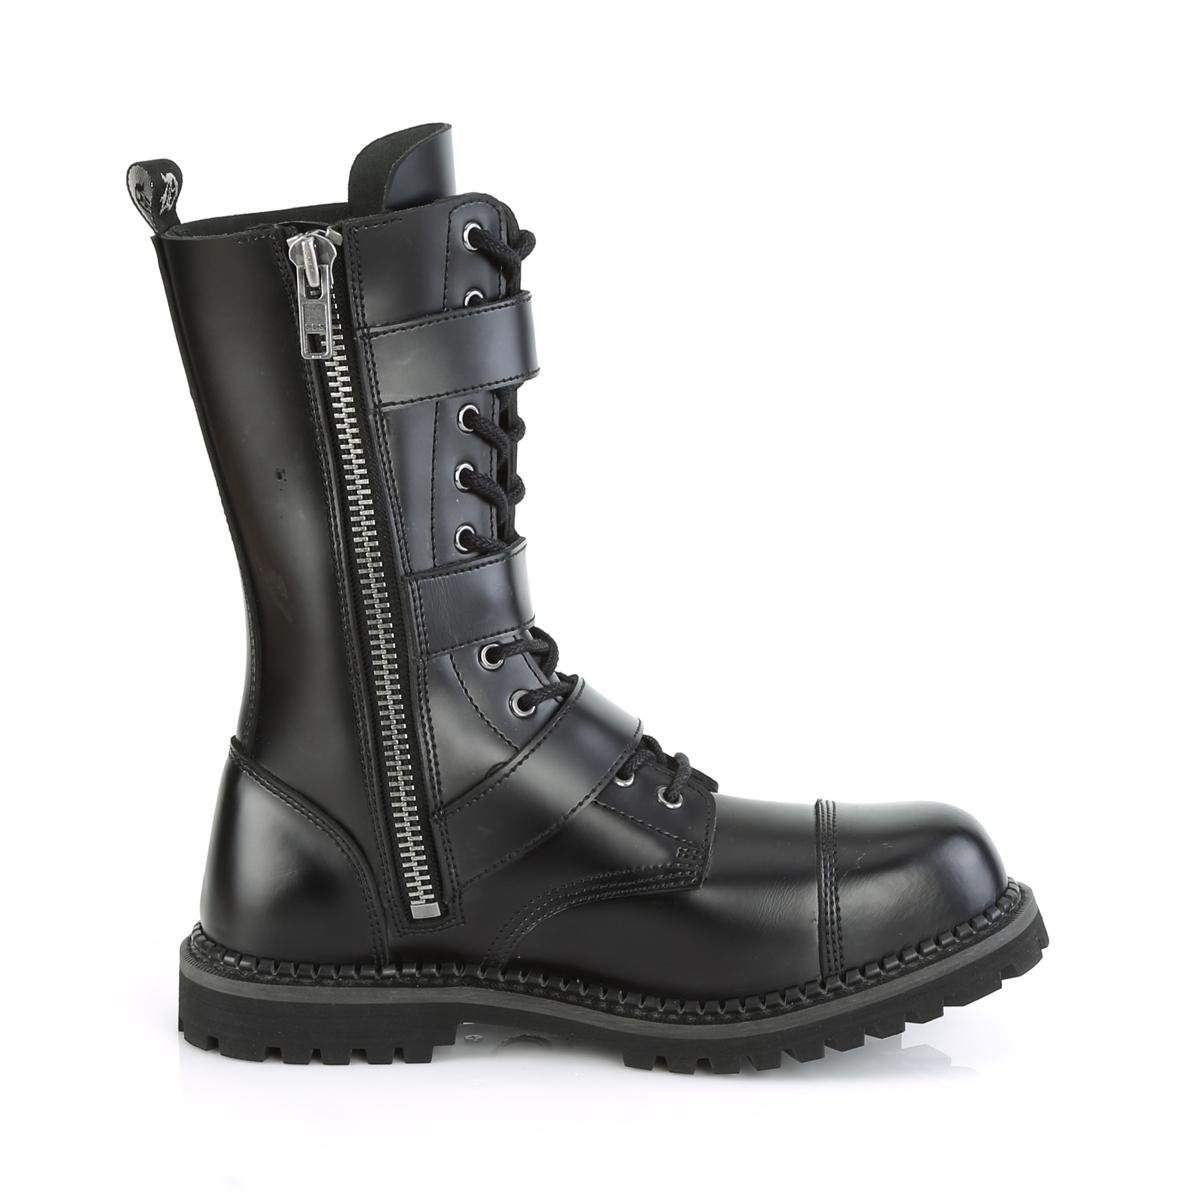 Demonia(デモニア) RIOT-12BK スティールトゥ バックルストラップ&編み上げブーツ 12アイレット コンバットブーツ 本革黒 #Men's/Unisex◆取り寄せ